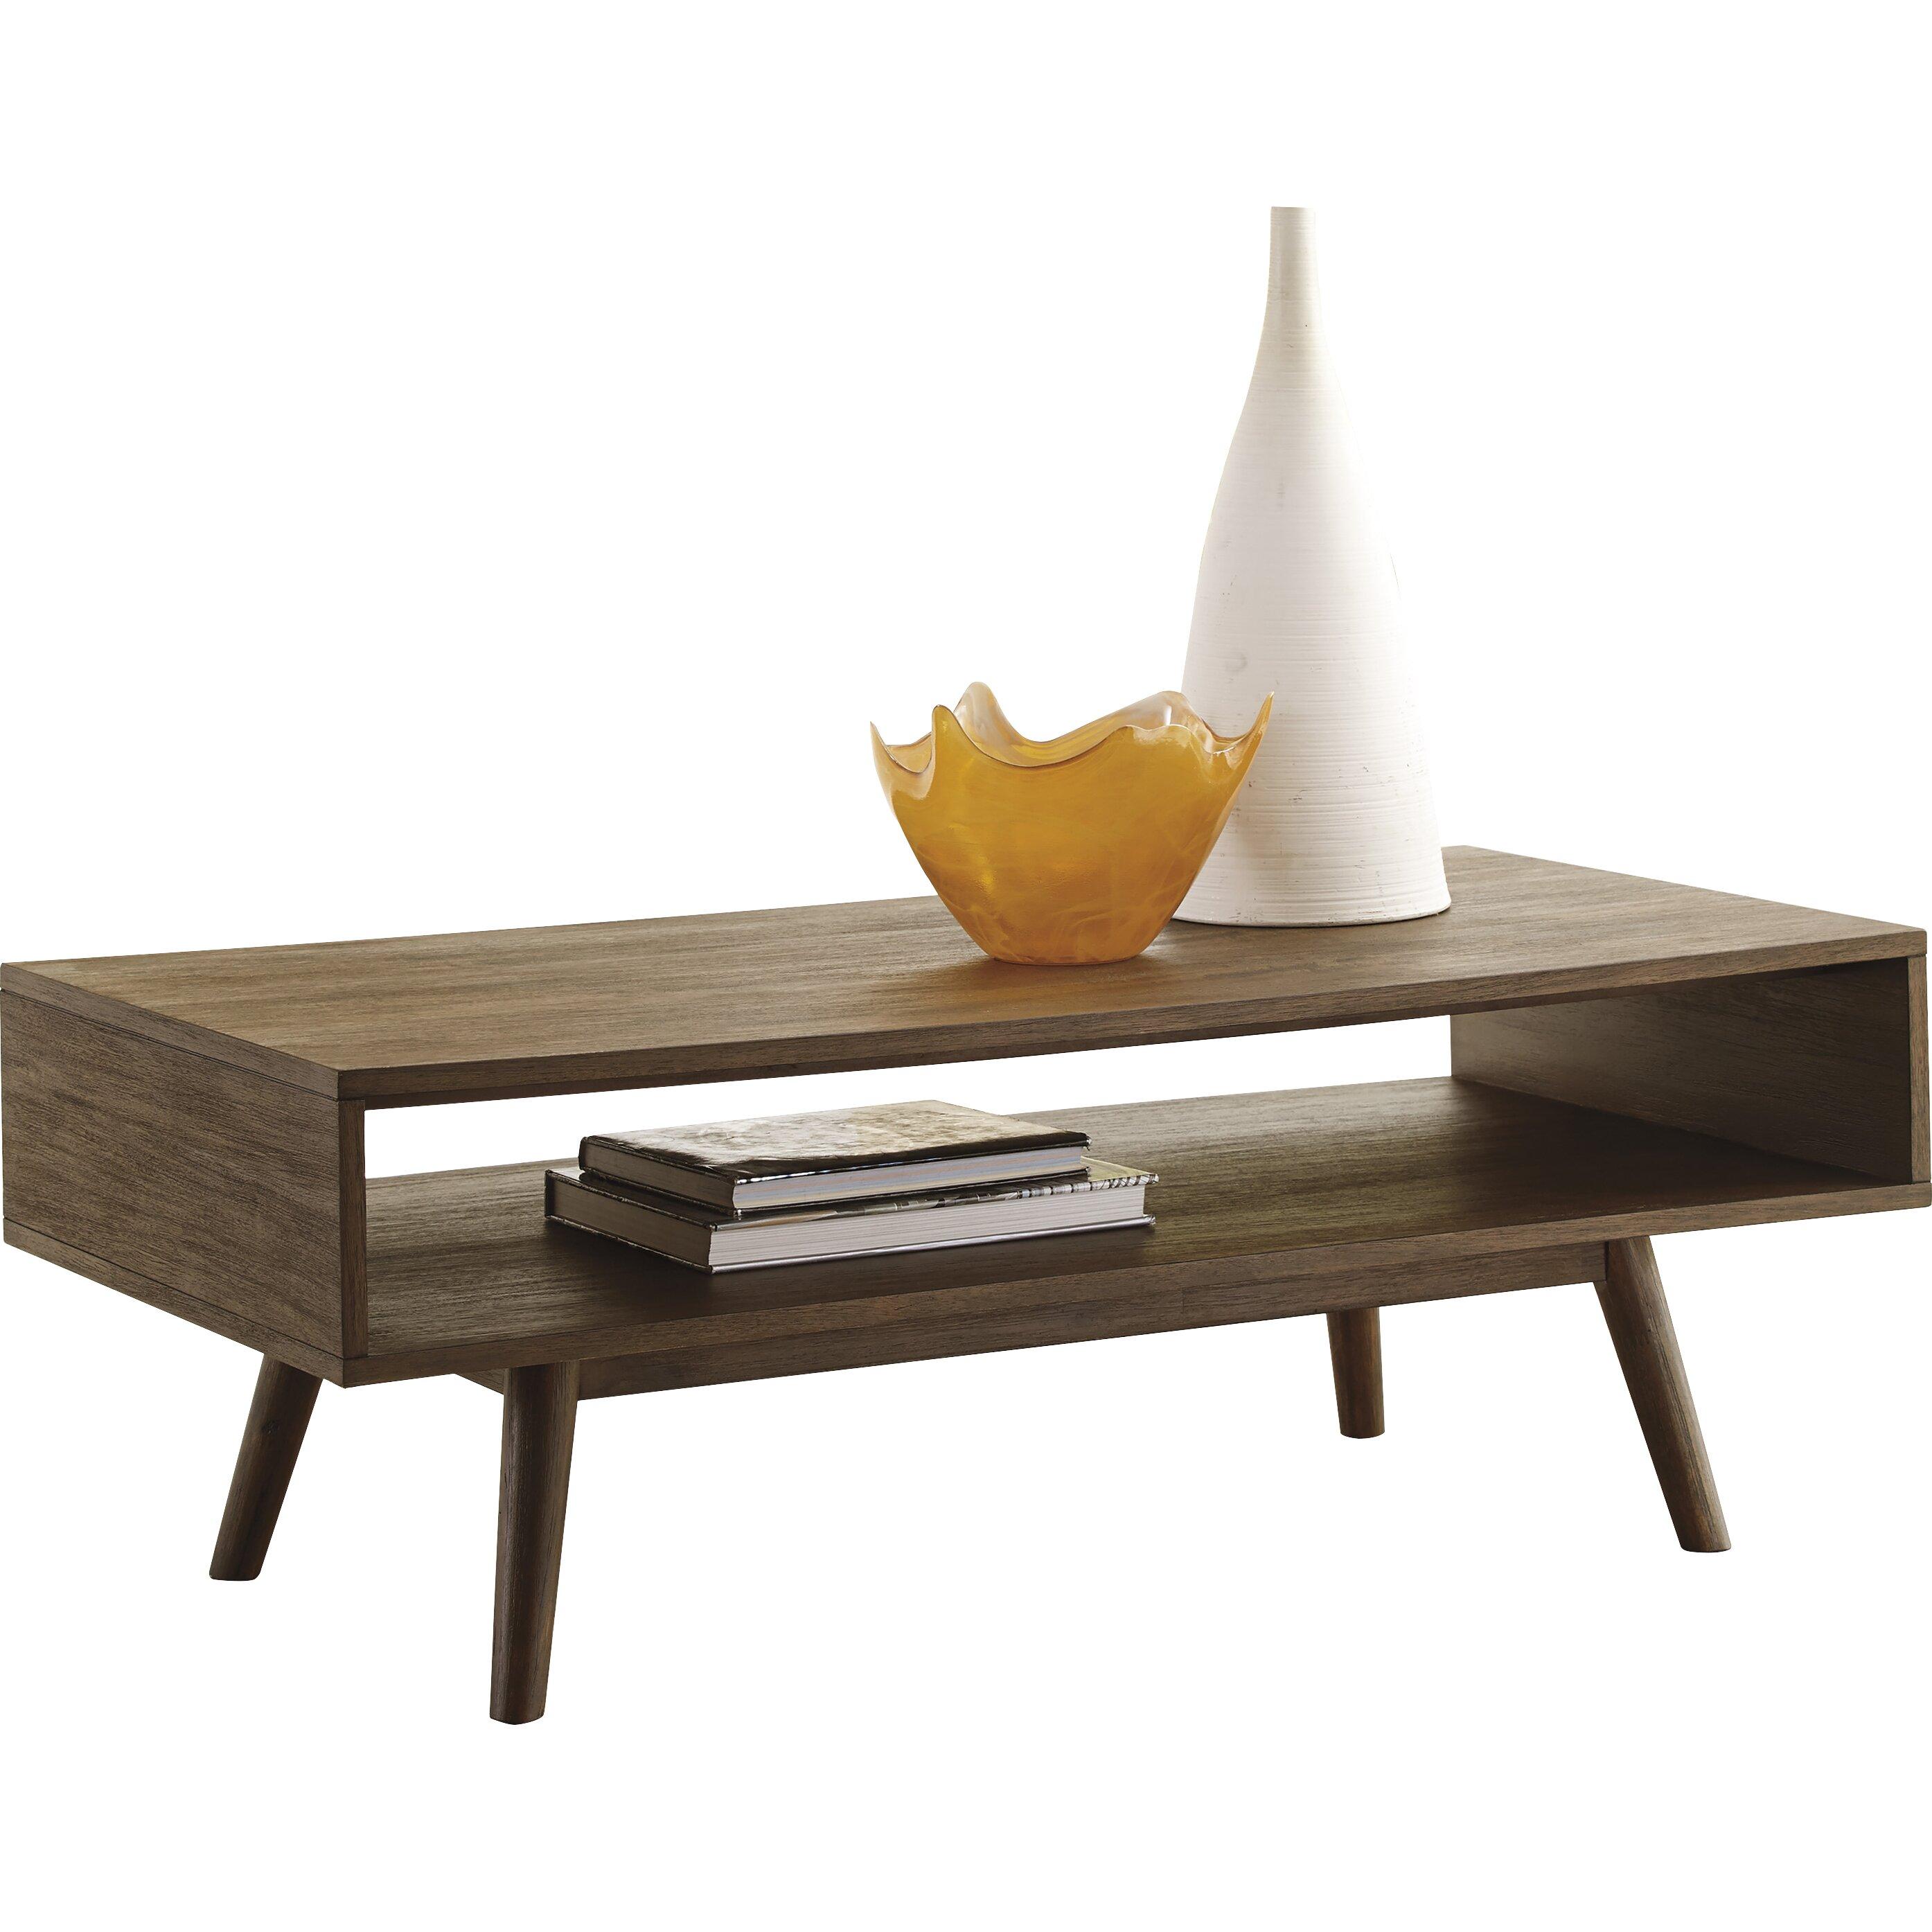 S Shaped Coffee Table Books Coffee Table Coffee Addicts